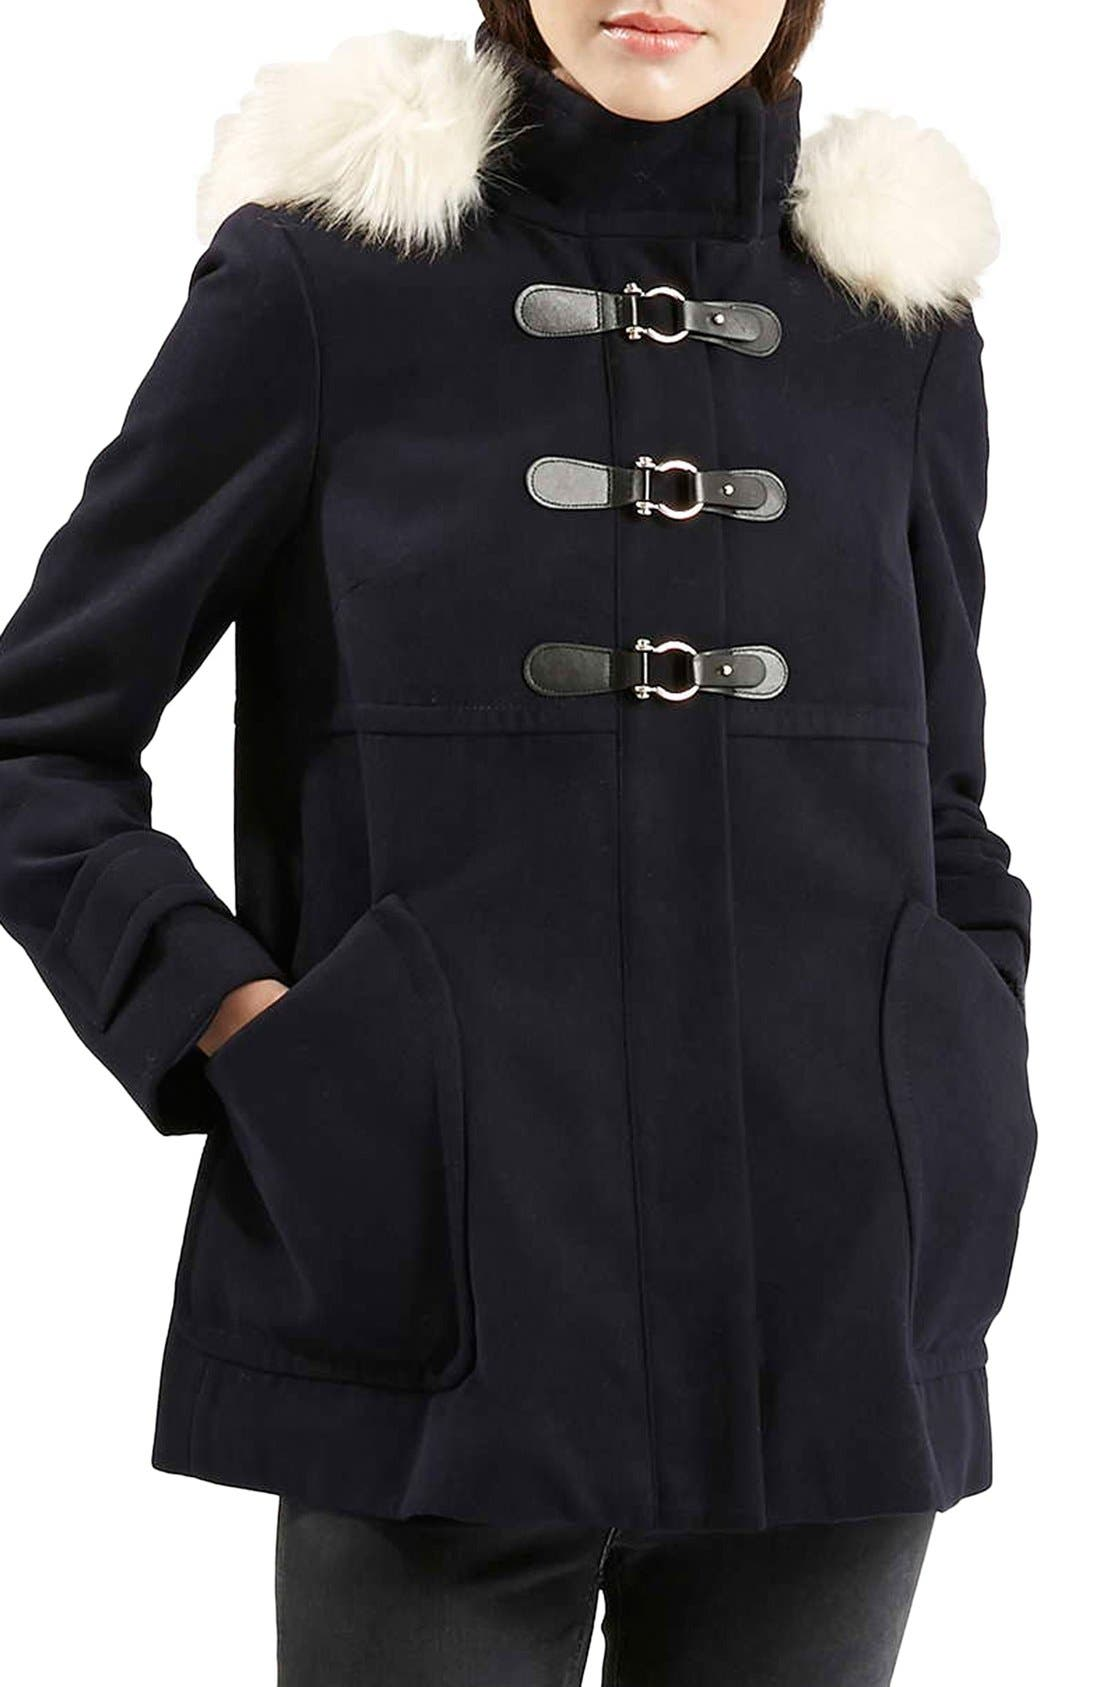 Main Image - Topshop 'Hattie' Faux Fur Trim DuffleCoat